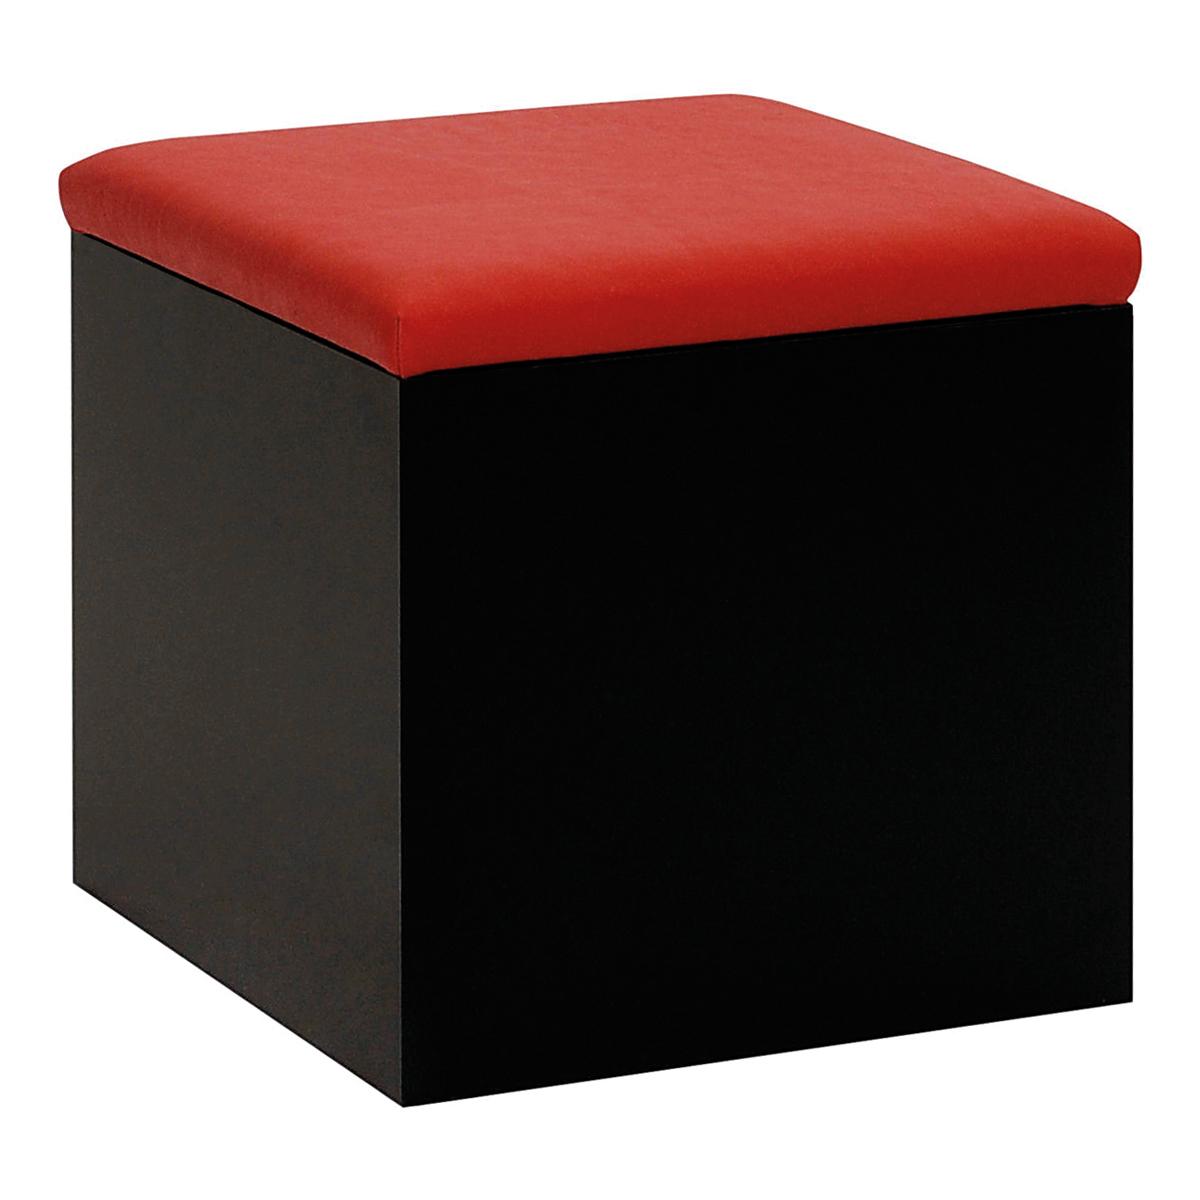 Hocker Cubus, schwarz-rot